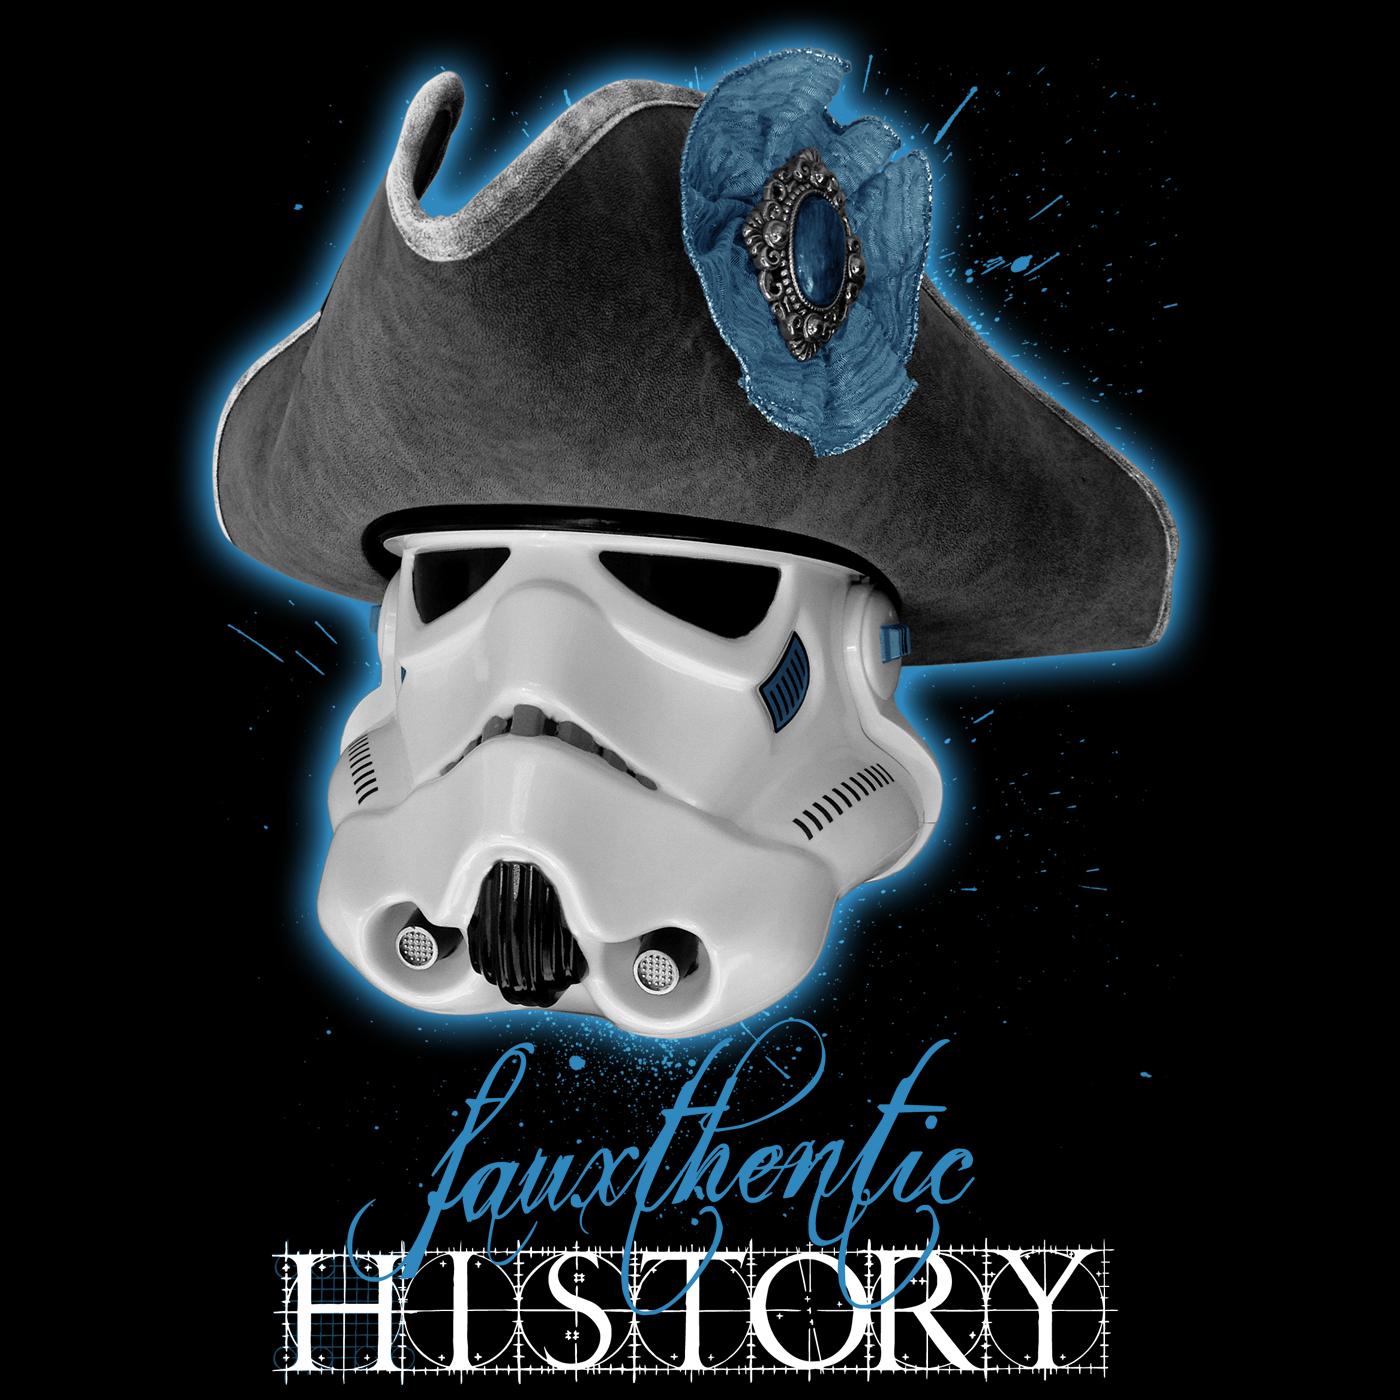 Fauxthentic History show art